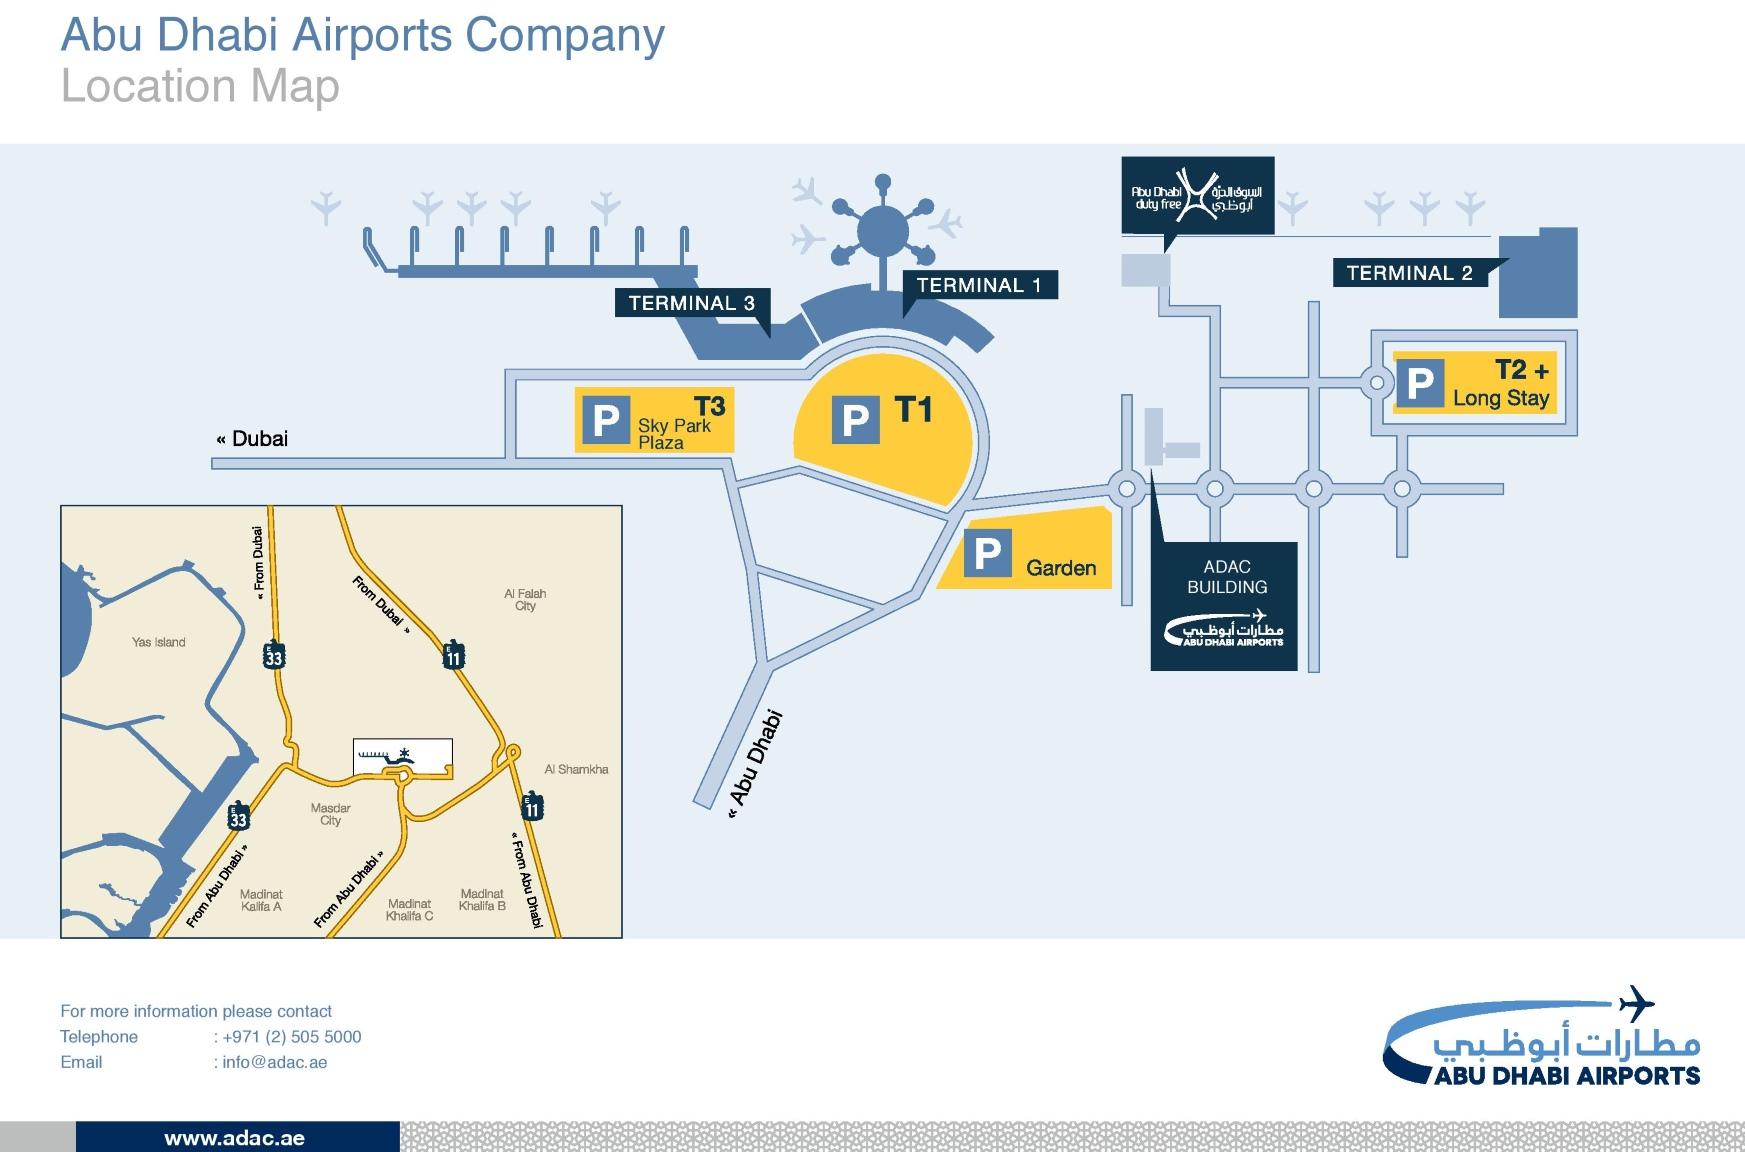 Abu Dhabi Airport Map Abu Dhabi airport map Abu Dhabi Airport Map